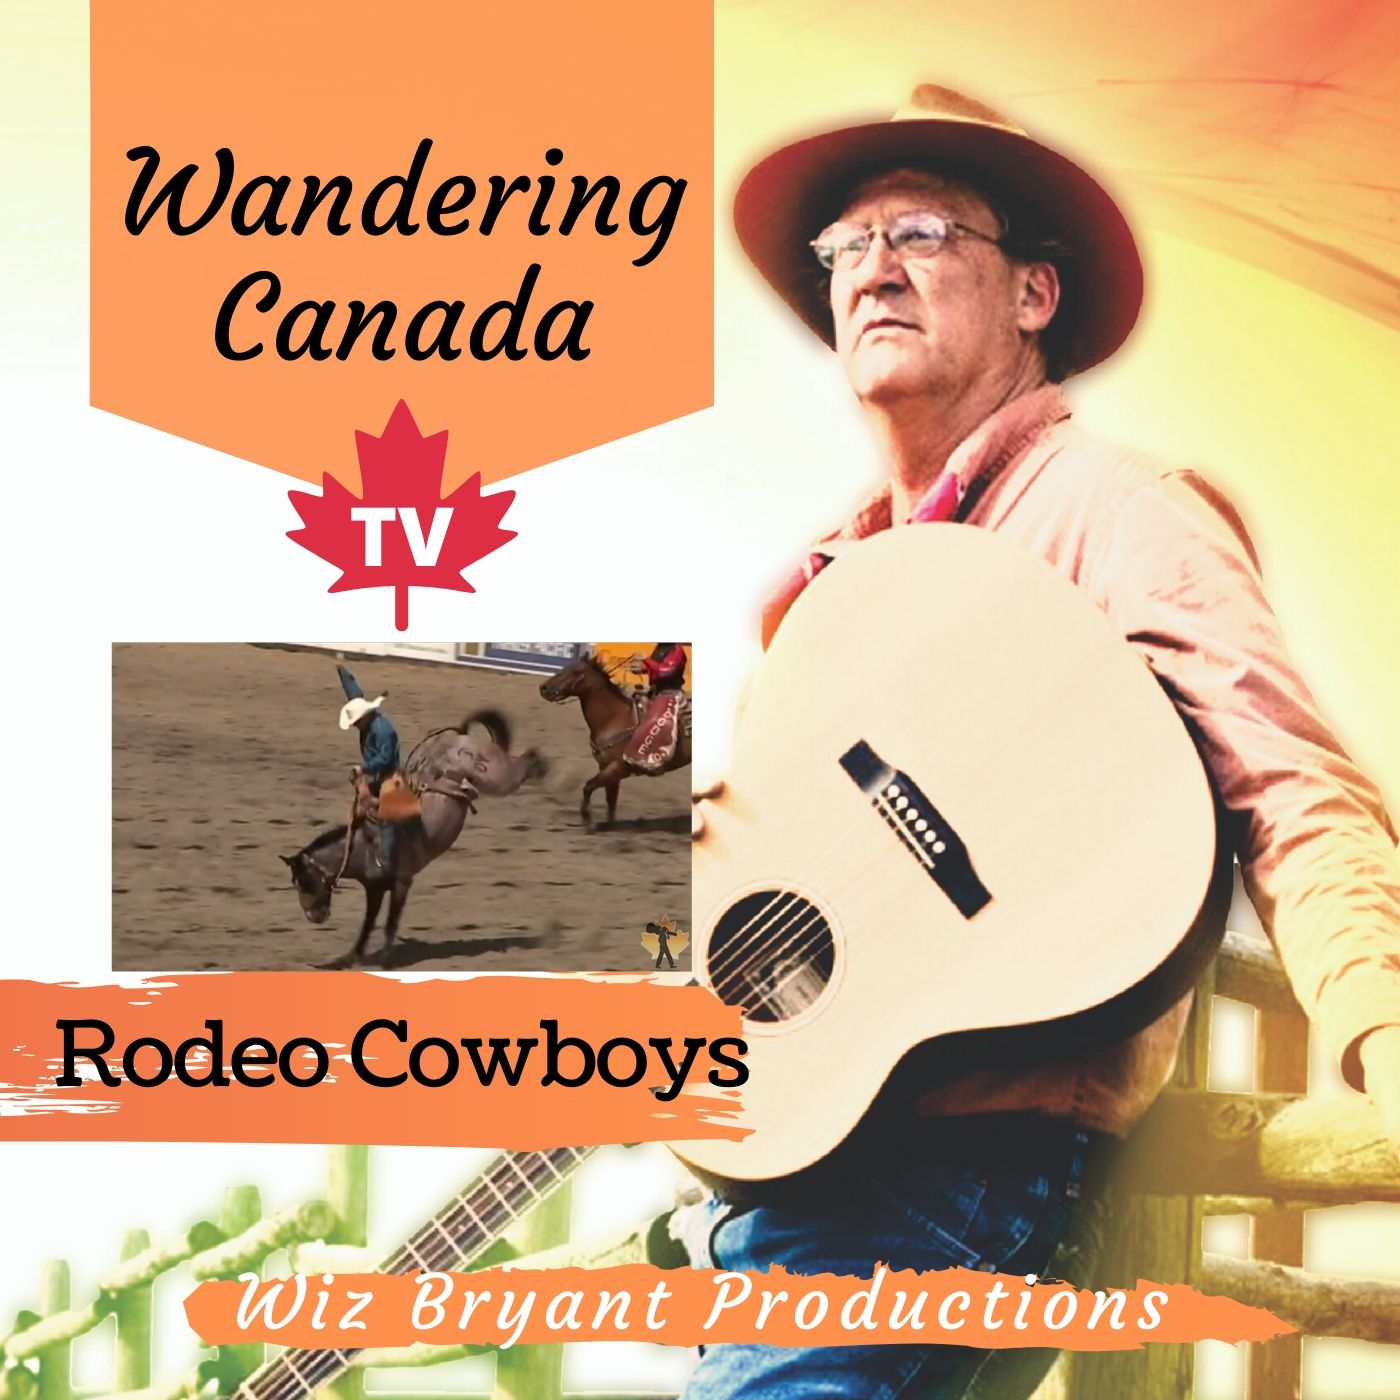 Wandering Canada TV